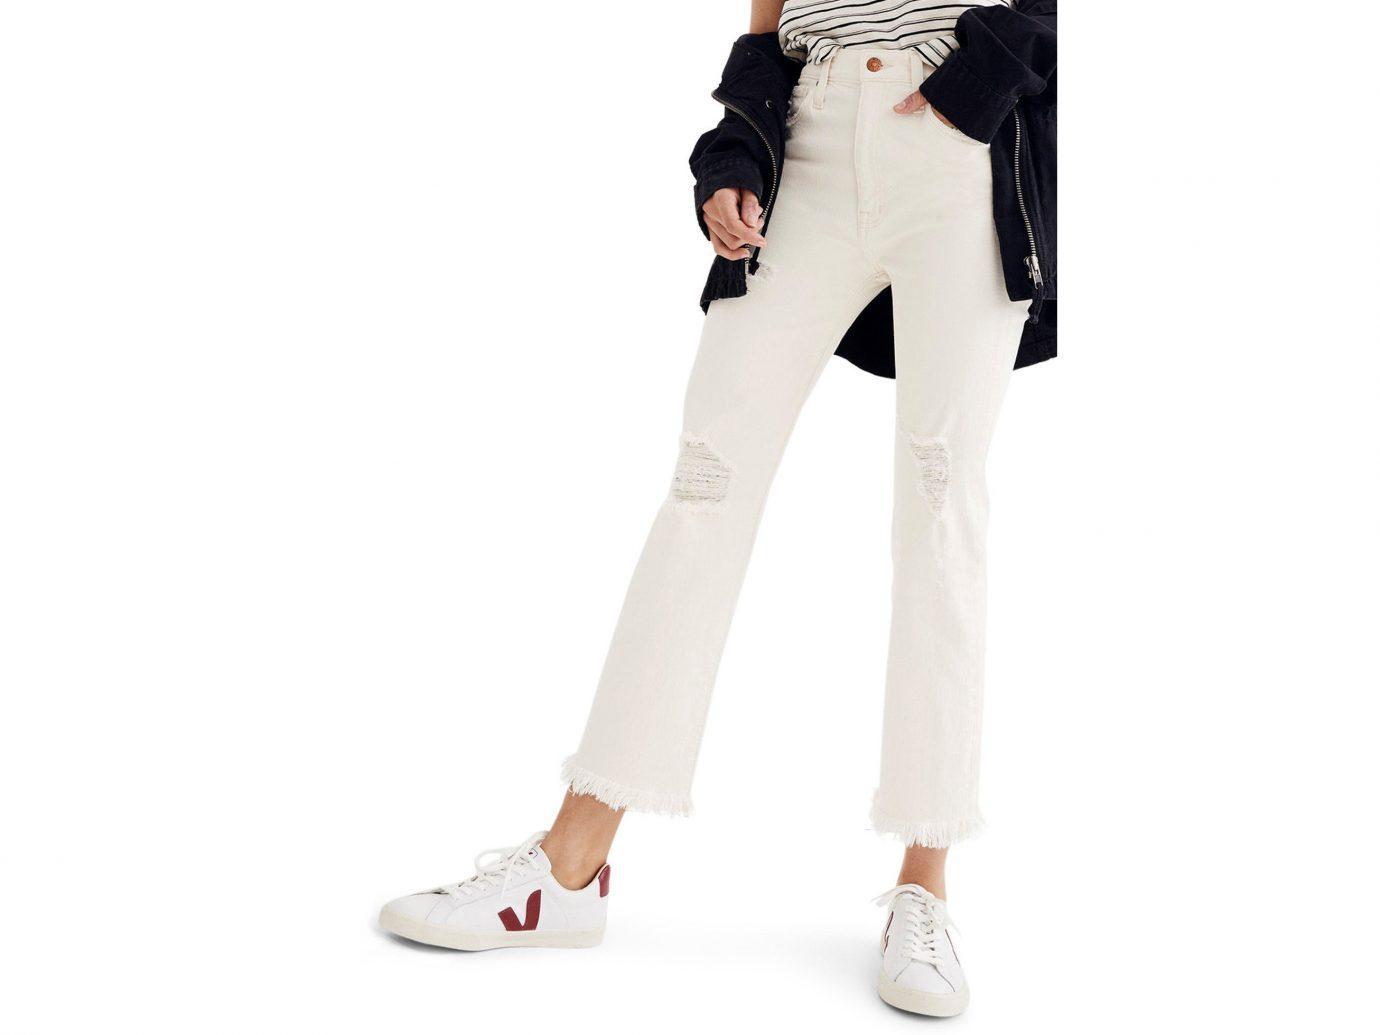 Style + Design white clothing joint waist leg jeans shoe trousers trunk leggings fashion model abdomen trouser knee dressed